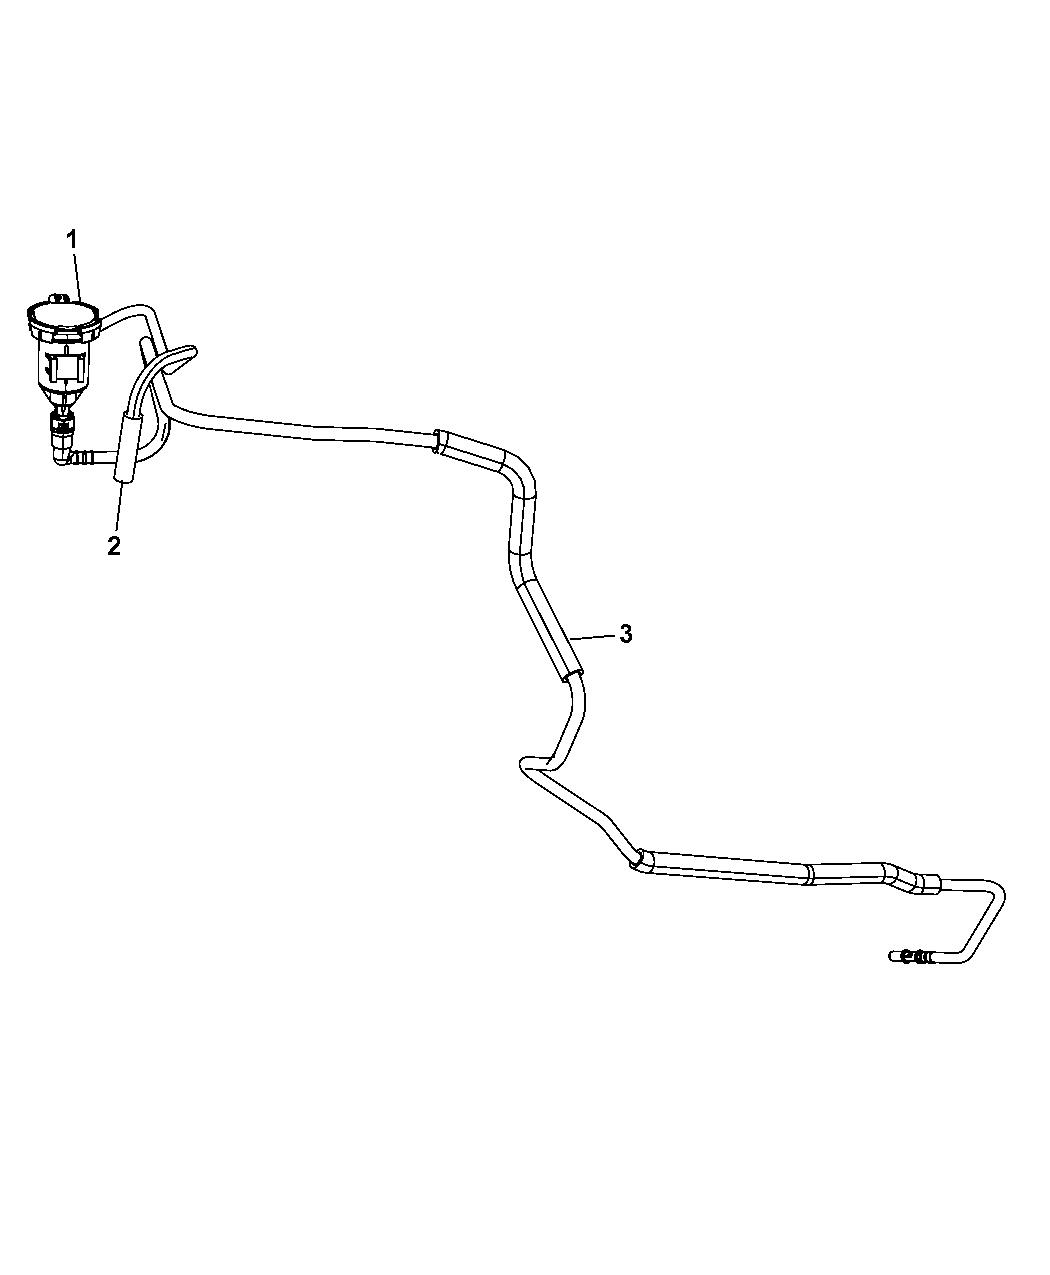 2009 Jeep Wrangler Emission Control Vacuum Harness